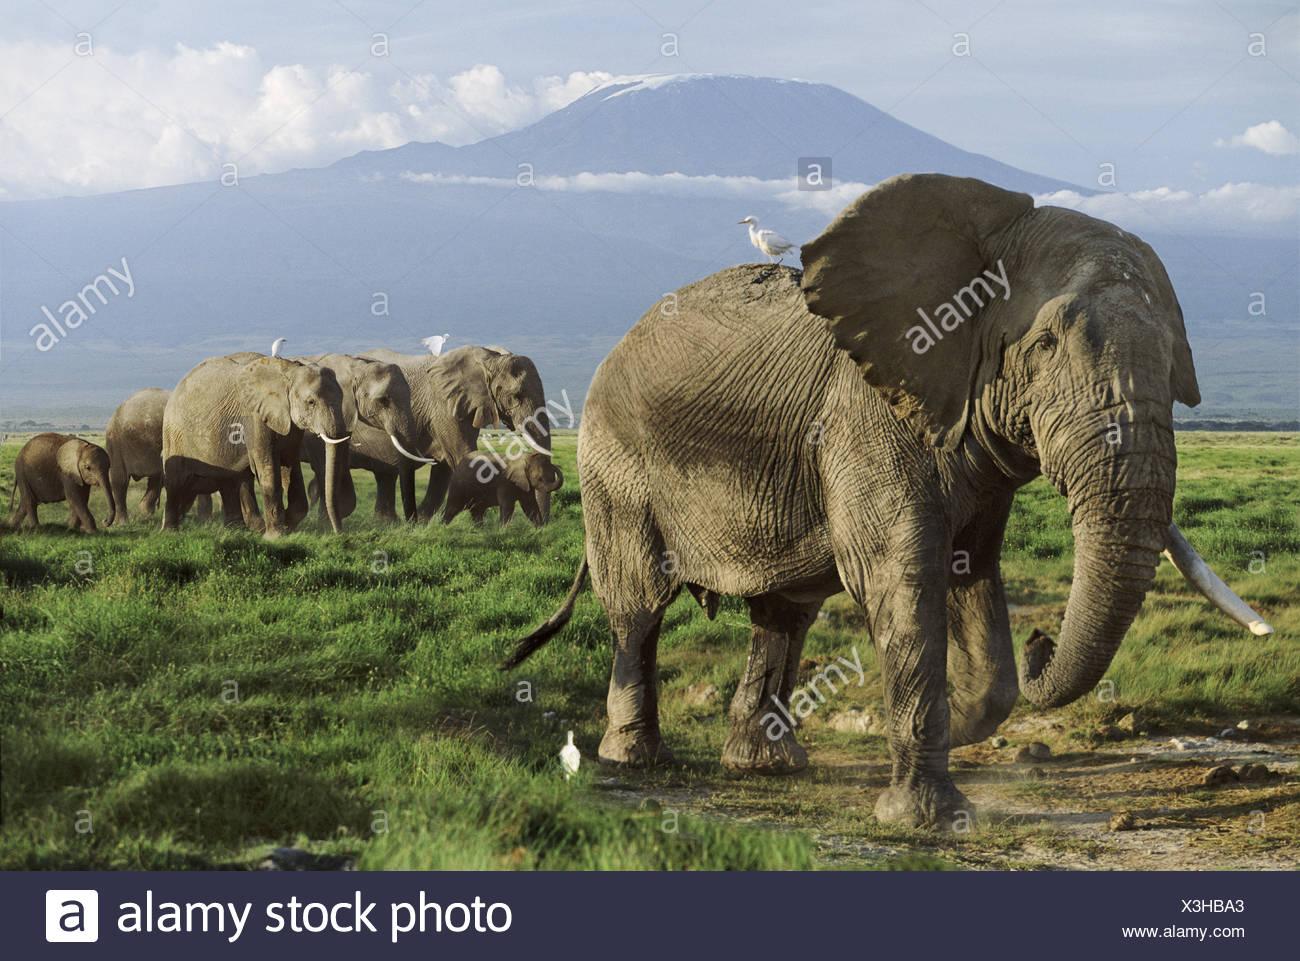 Elephant herd with Mt Kilimanjaro in the background Amboseli Kenya - Stock Image